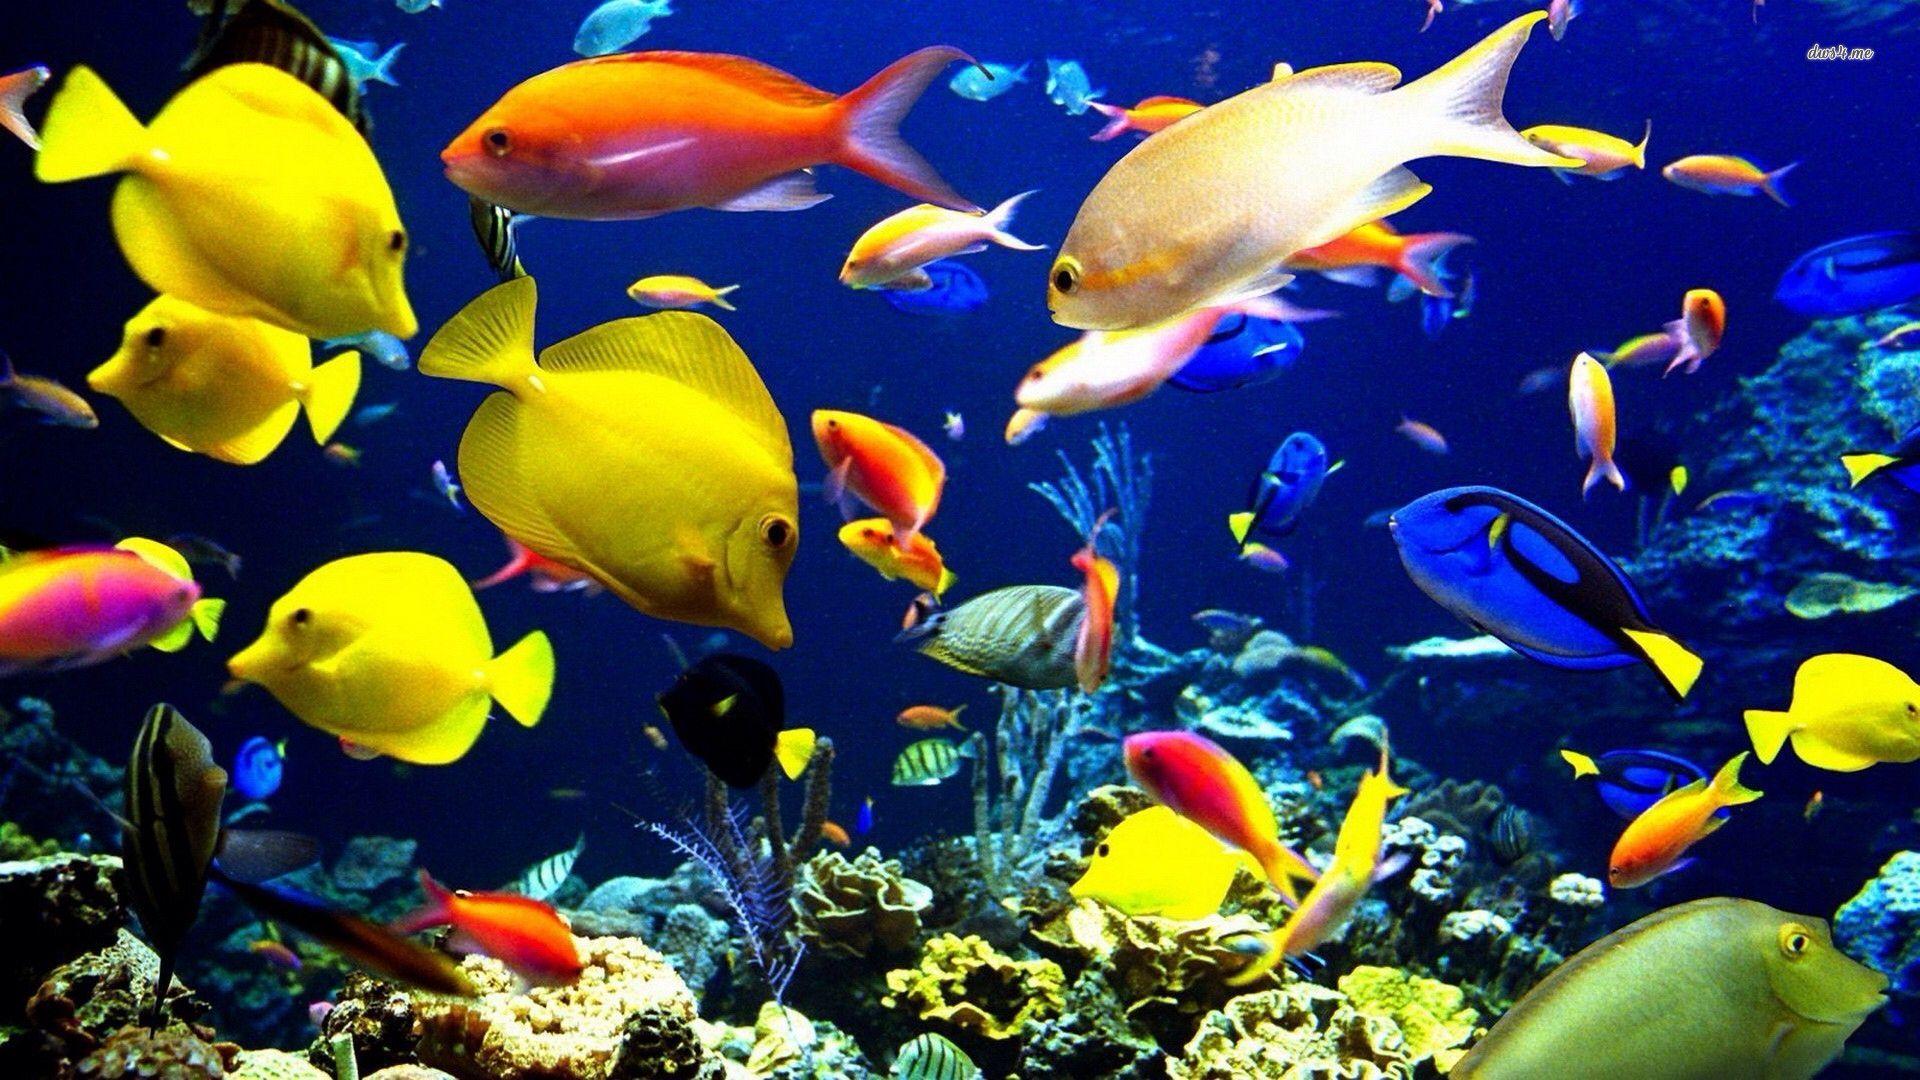 Image From Http Www Funchap Com Wp Content Uploads 2014 07 Tropical Fish Digital Art Wallpaper Jpg Kehidupan Laut Ikan Pemandangan